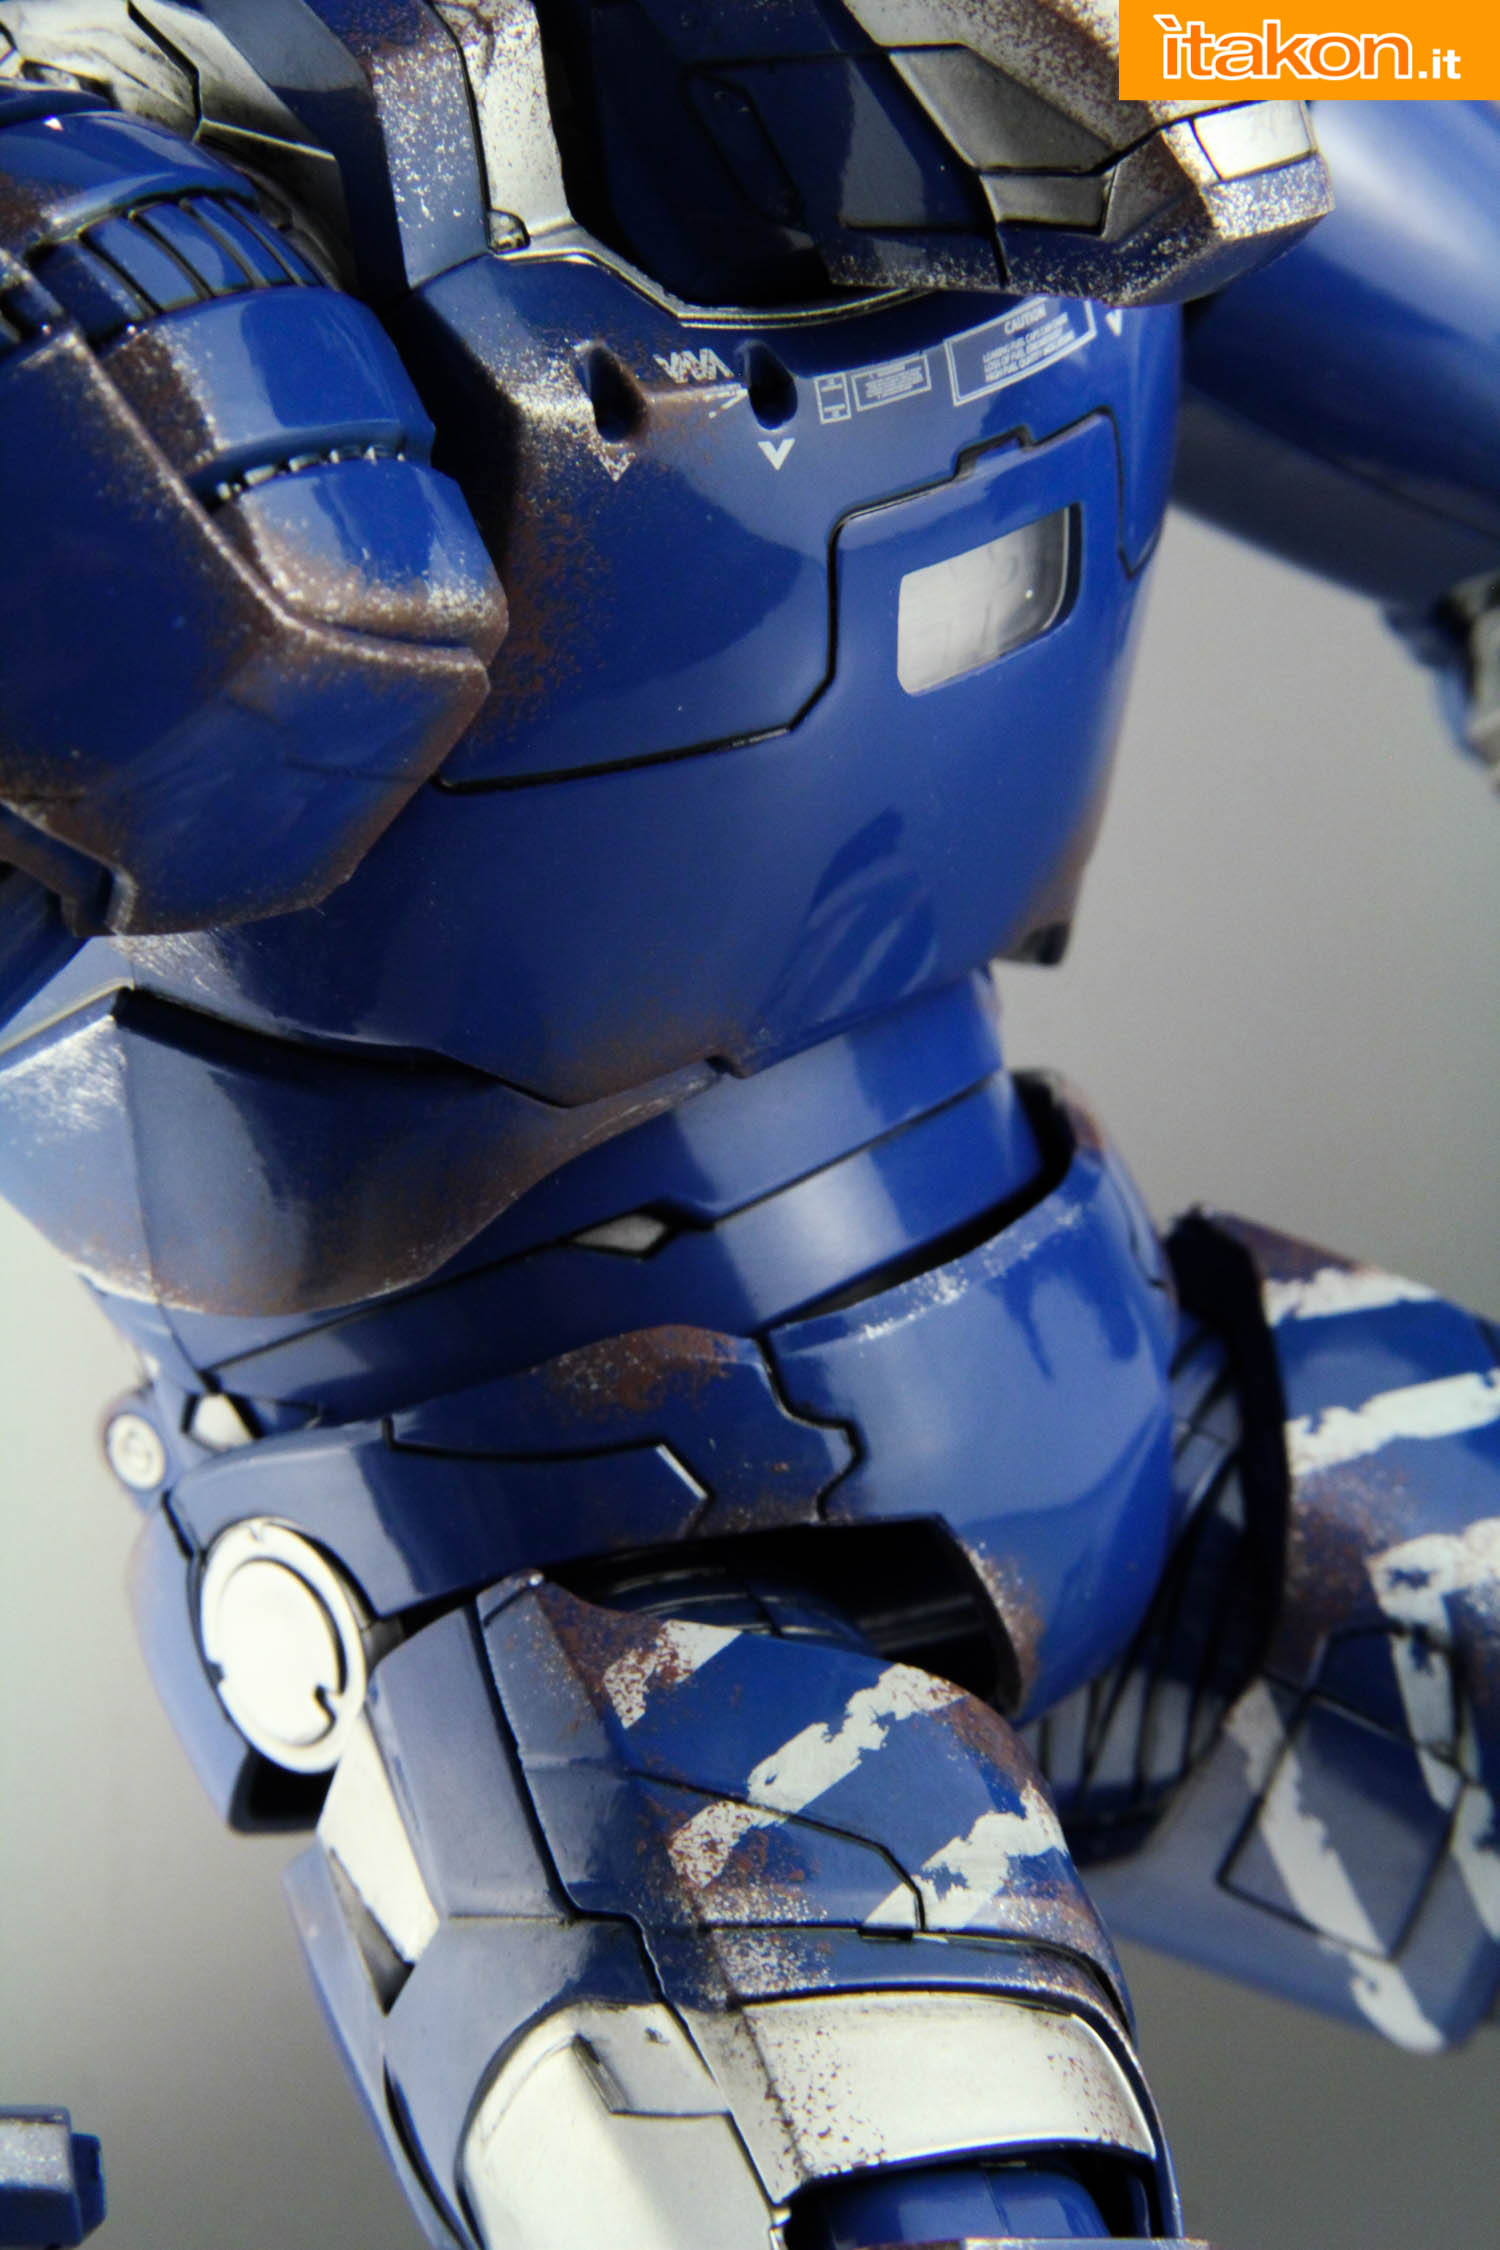 Link a comicave-igor-iron-man-figure-35